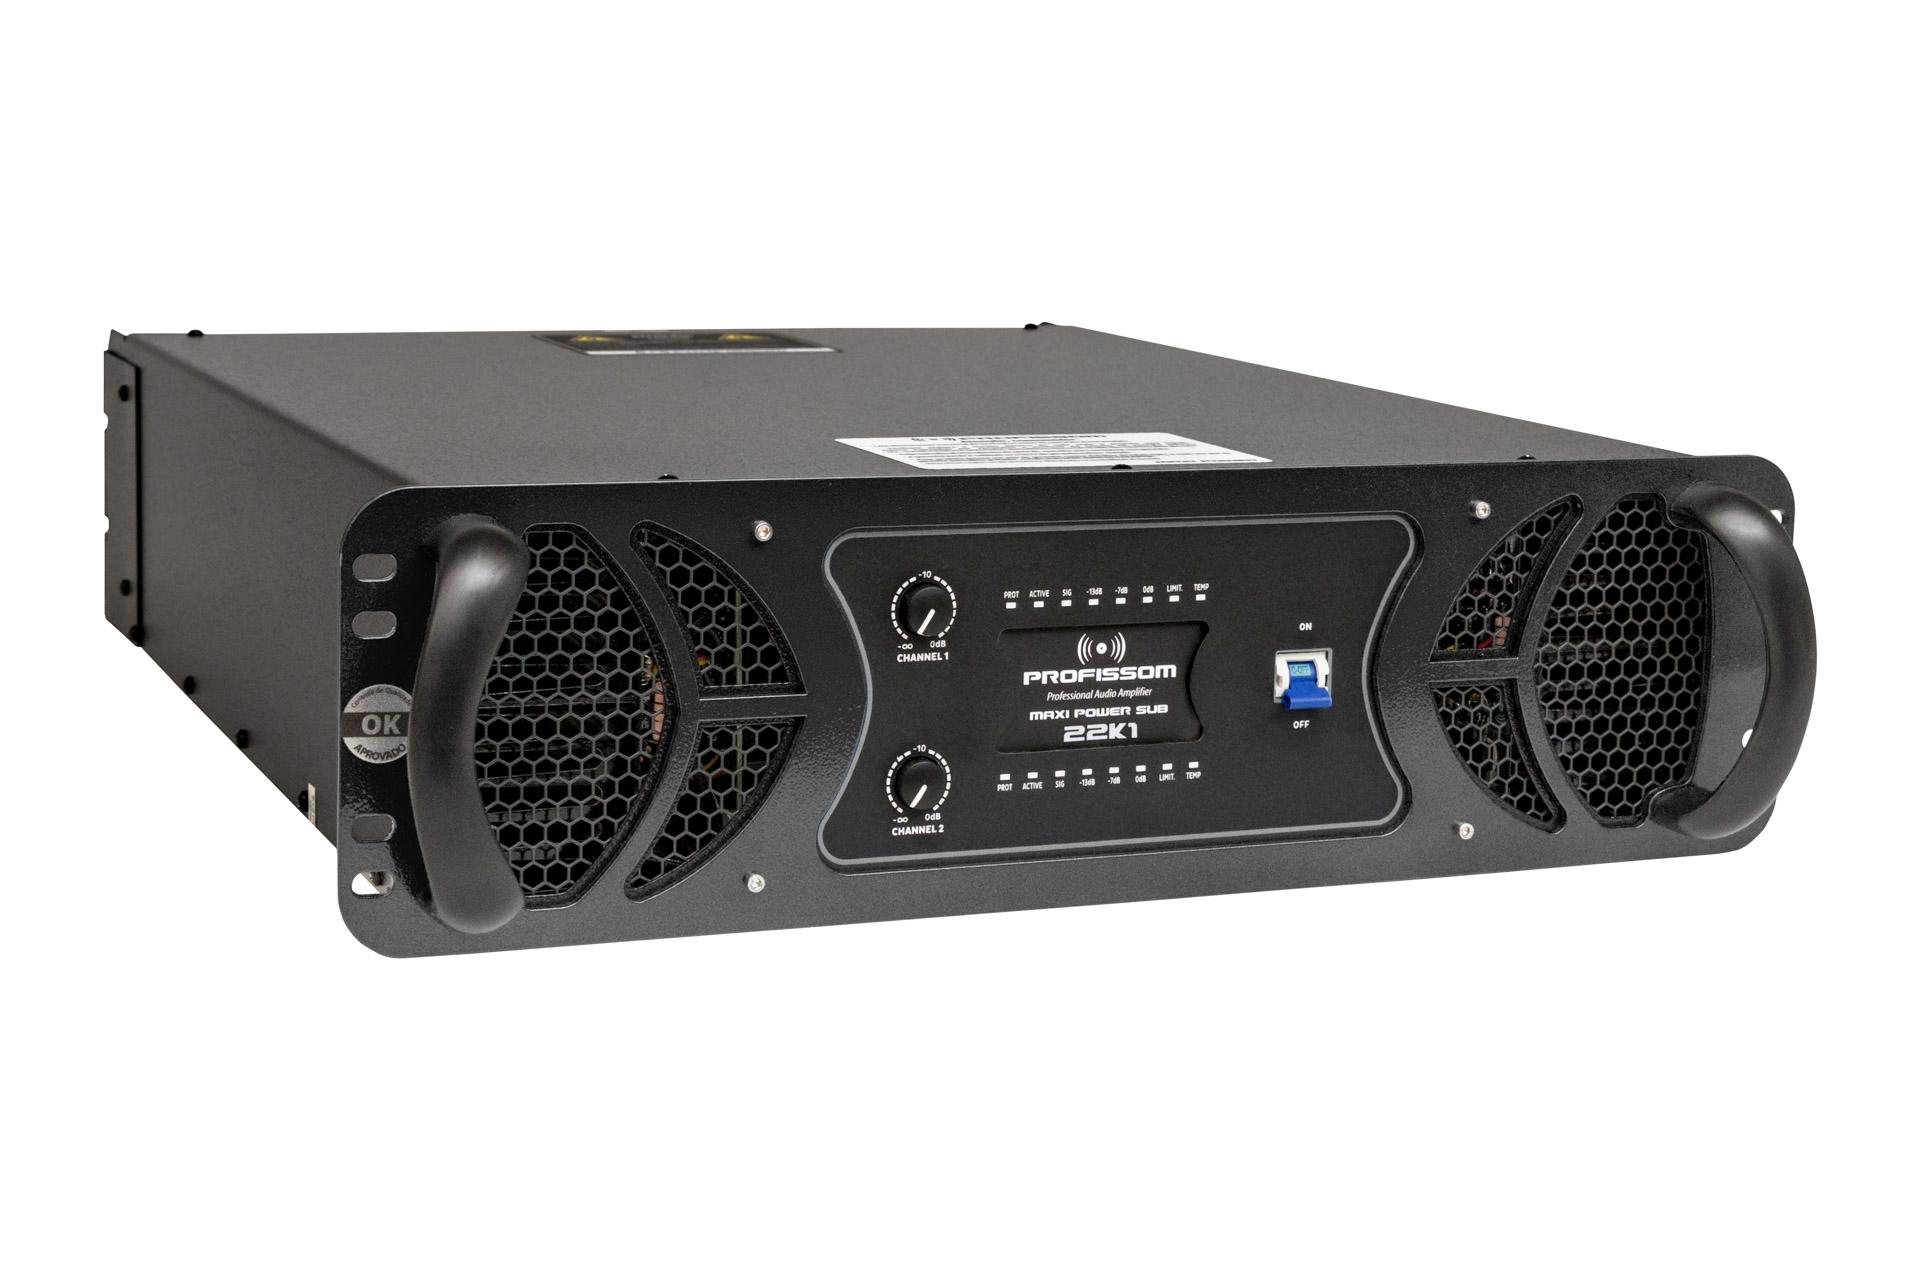 Amplificador Profissom Maxi Power Sub 22K1